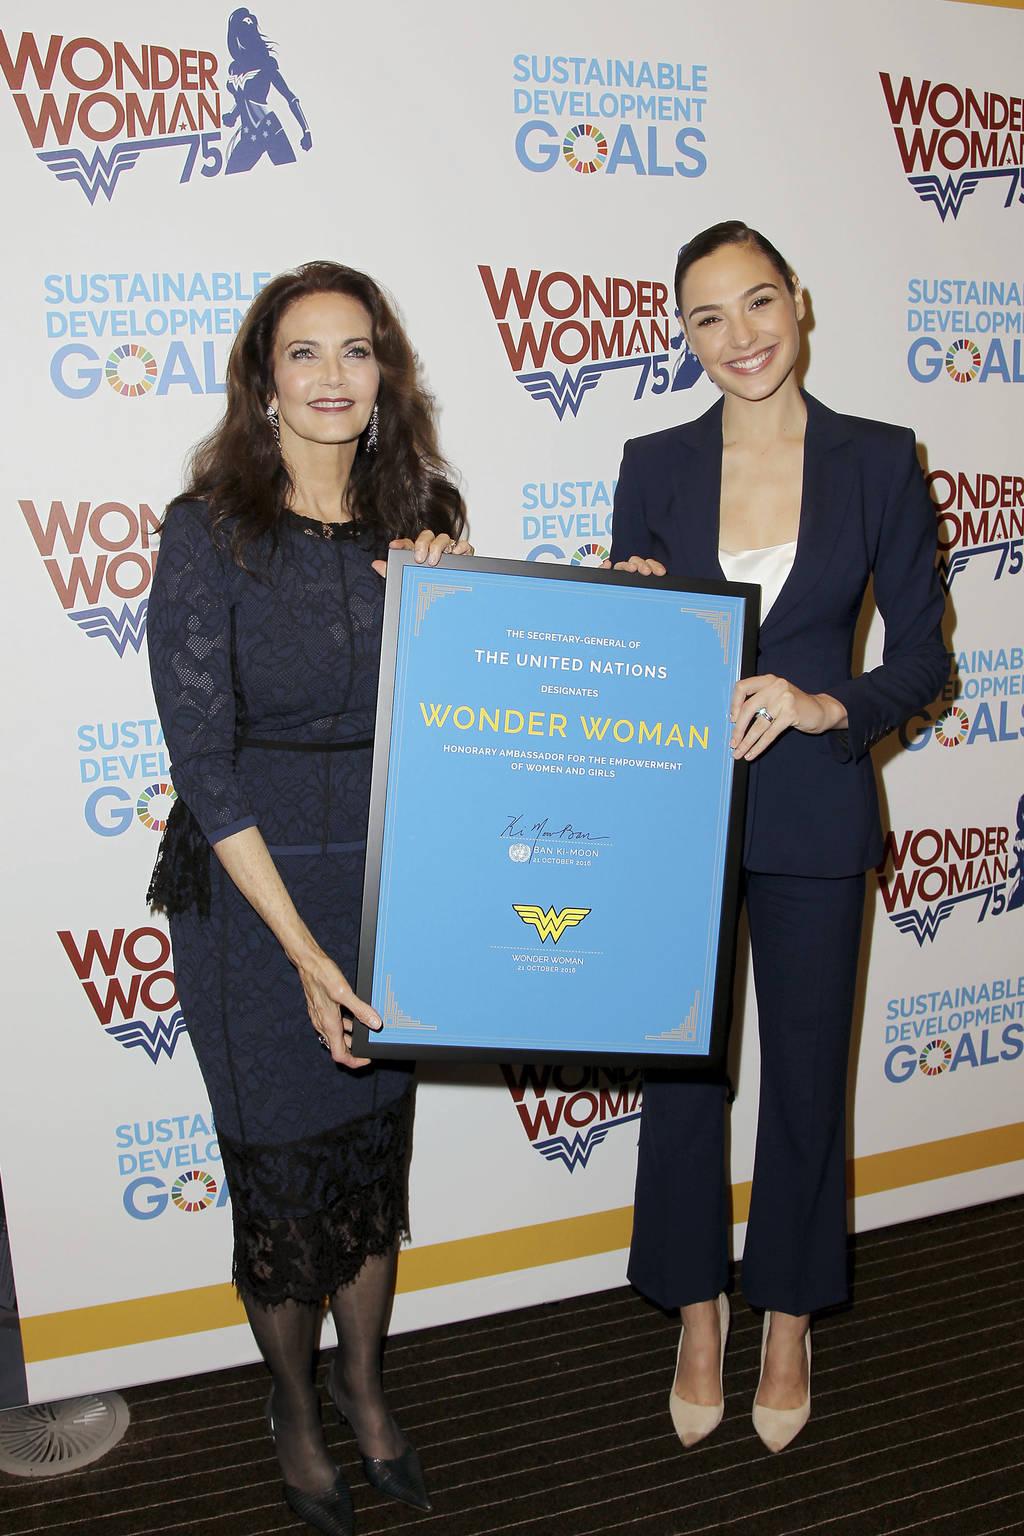 'Wonder Woman' ya es Embajadora